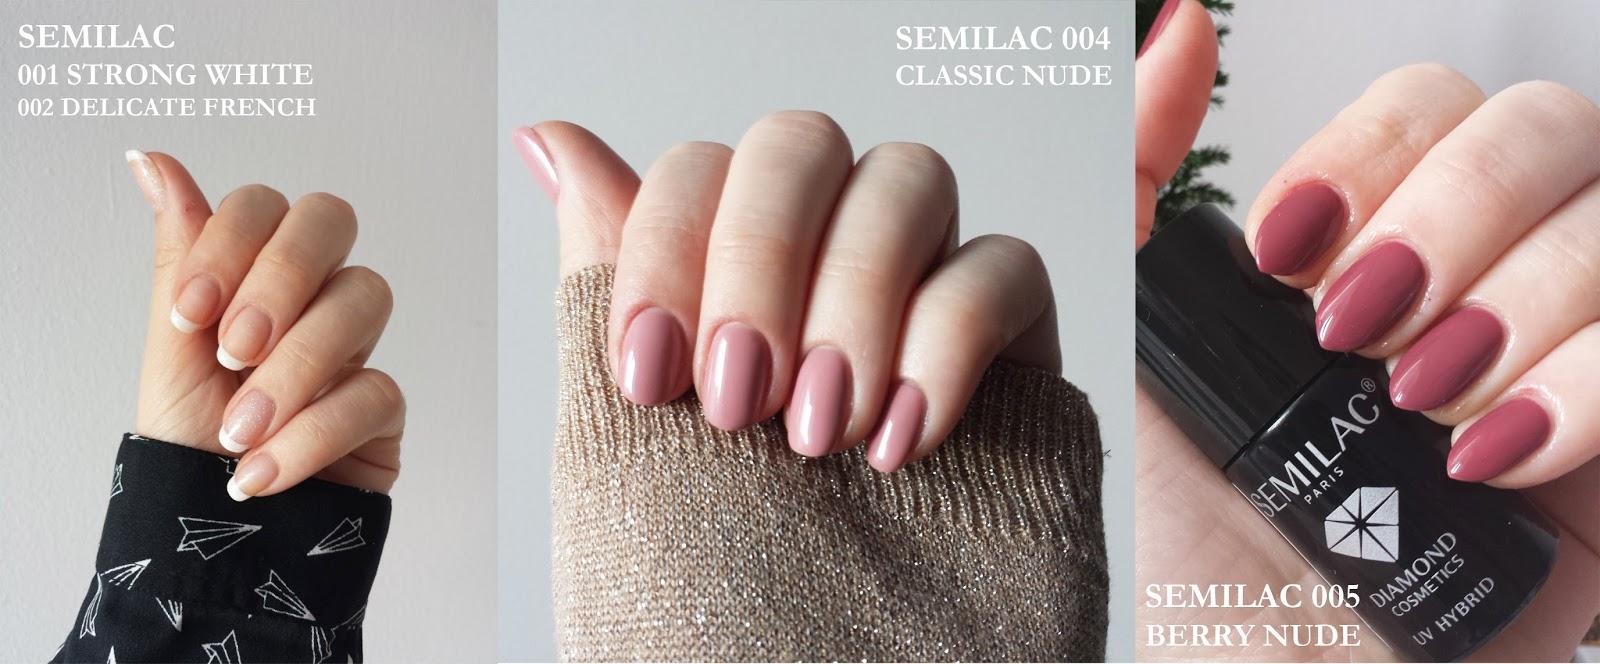 Marie Velte Moj Domowy Manicure Kolory Semilac